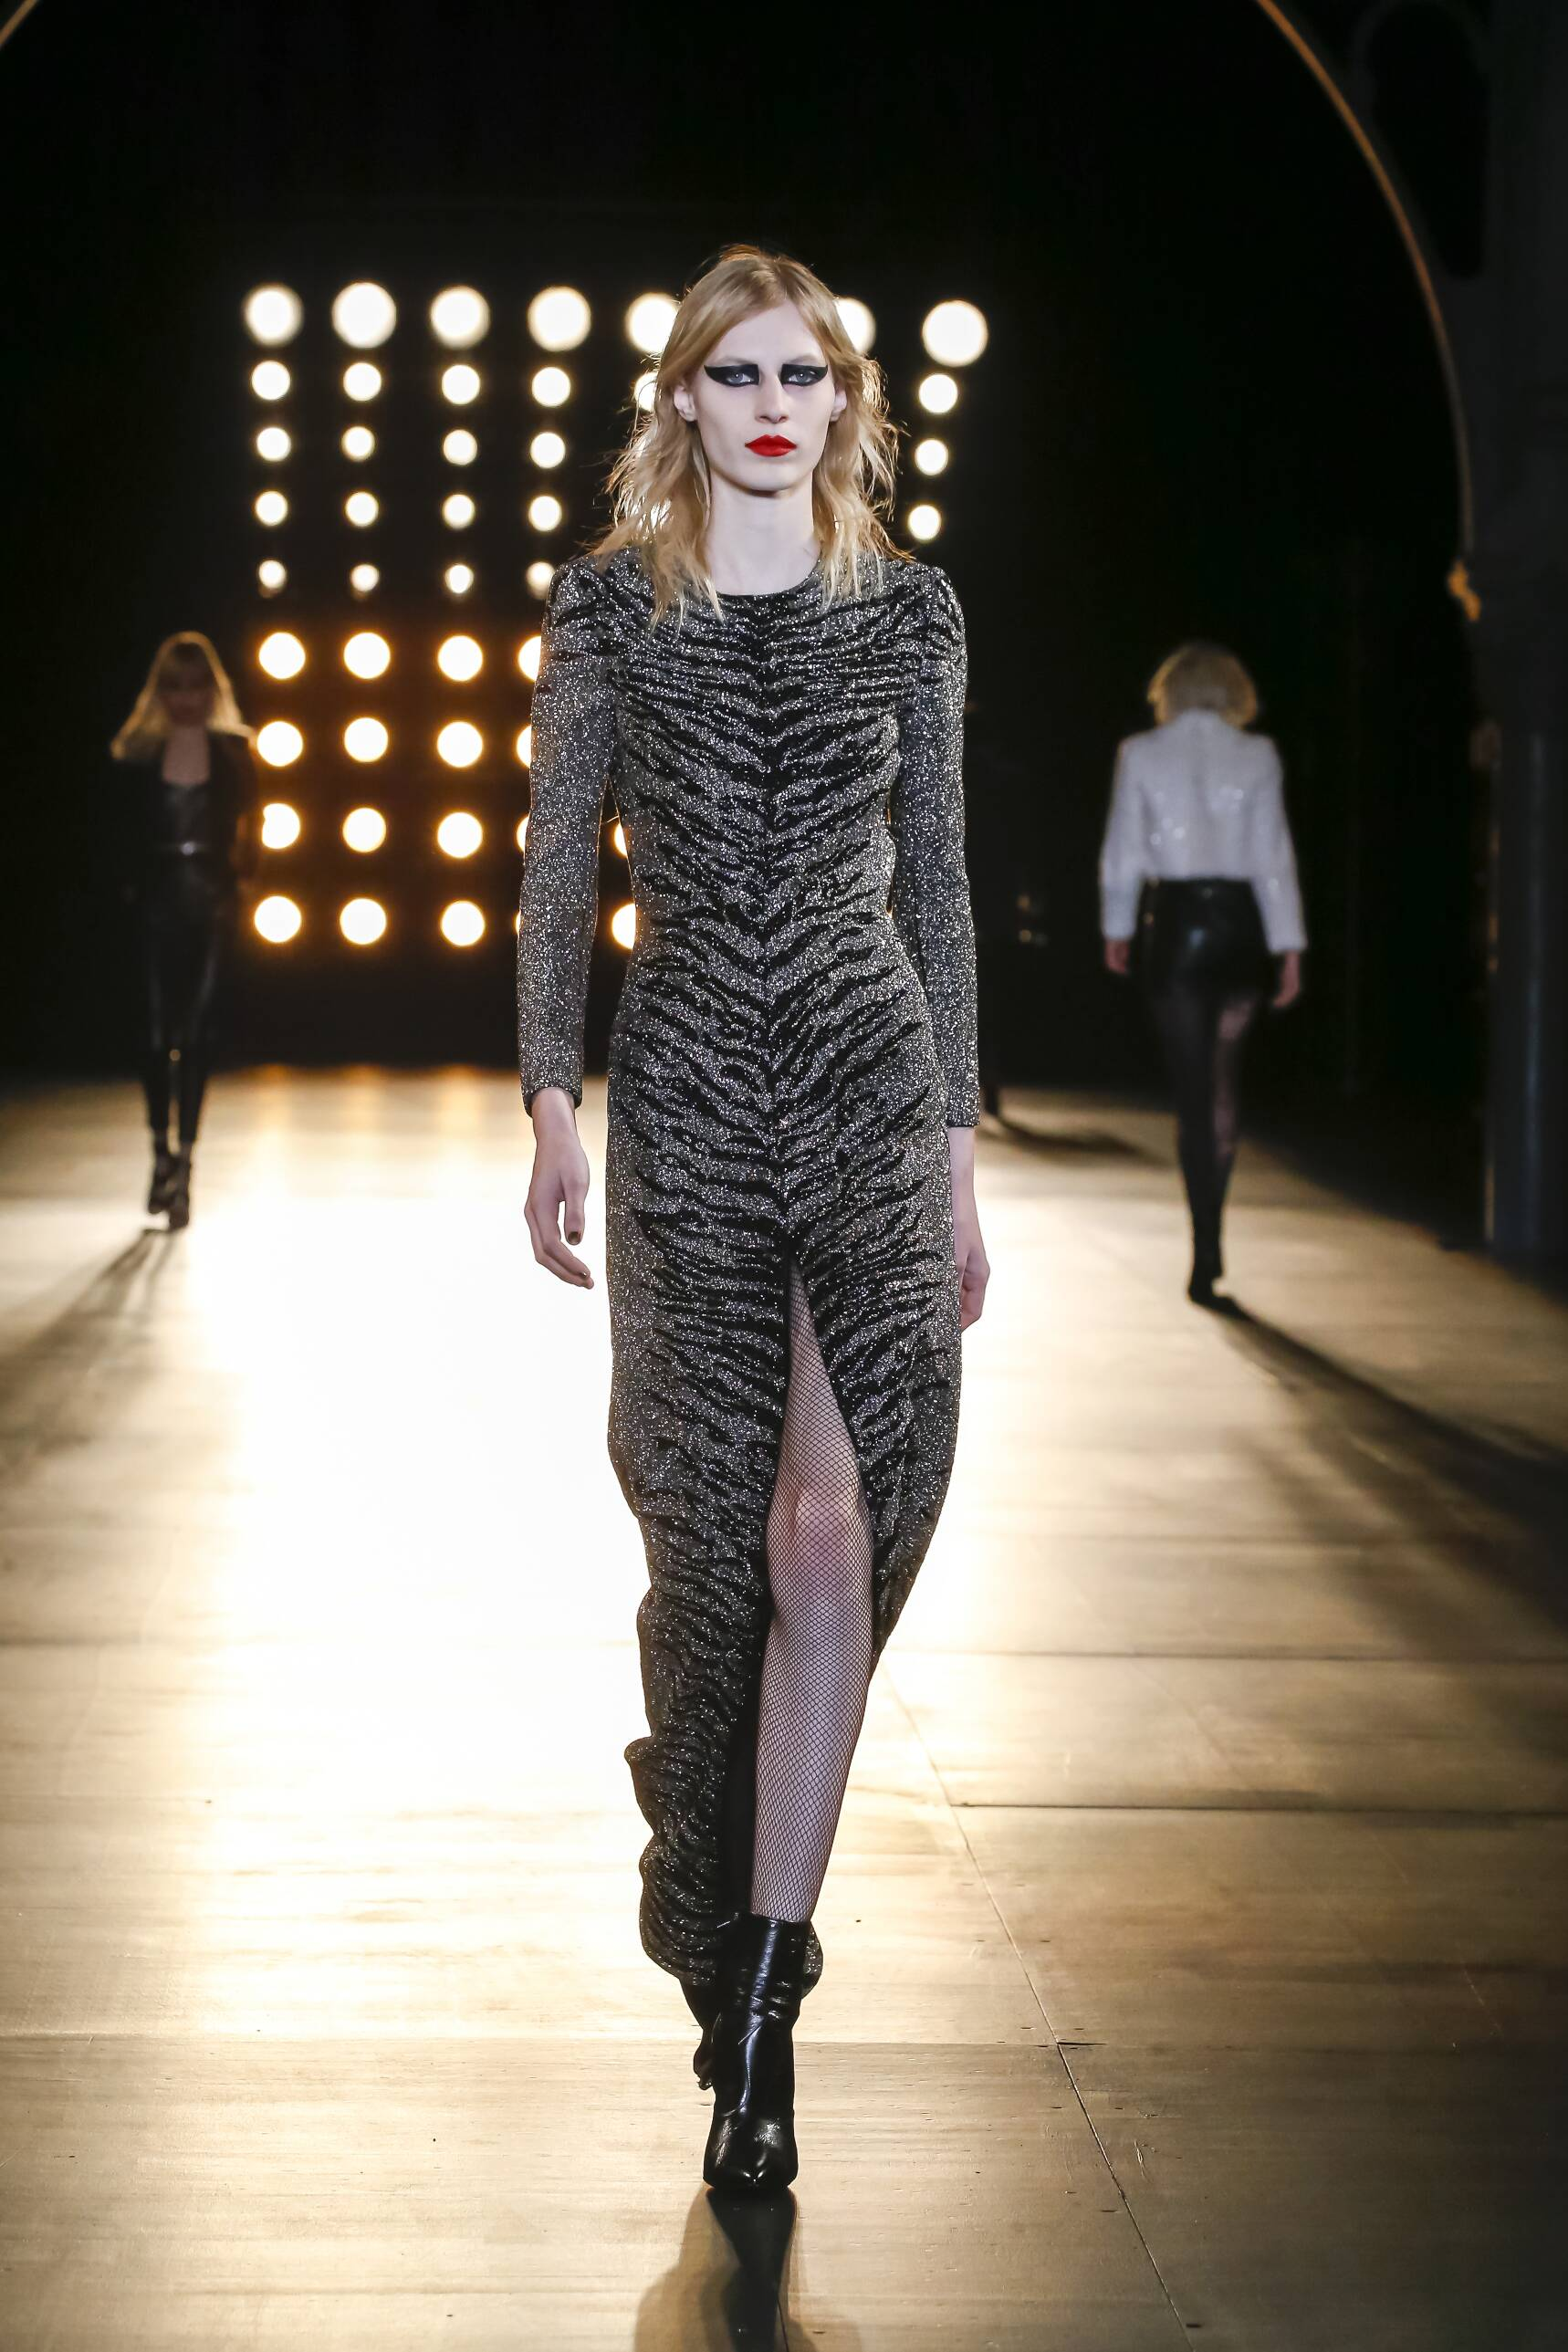 Saint Laurent Fall Winter 2015 16 Womenswear Collection Paris Fashion Week Fashion Show